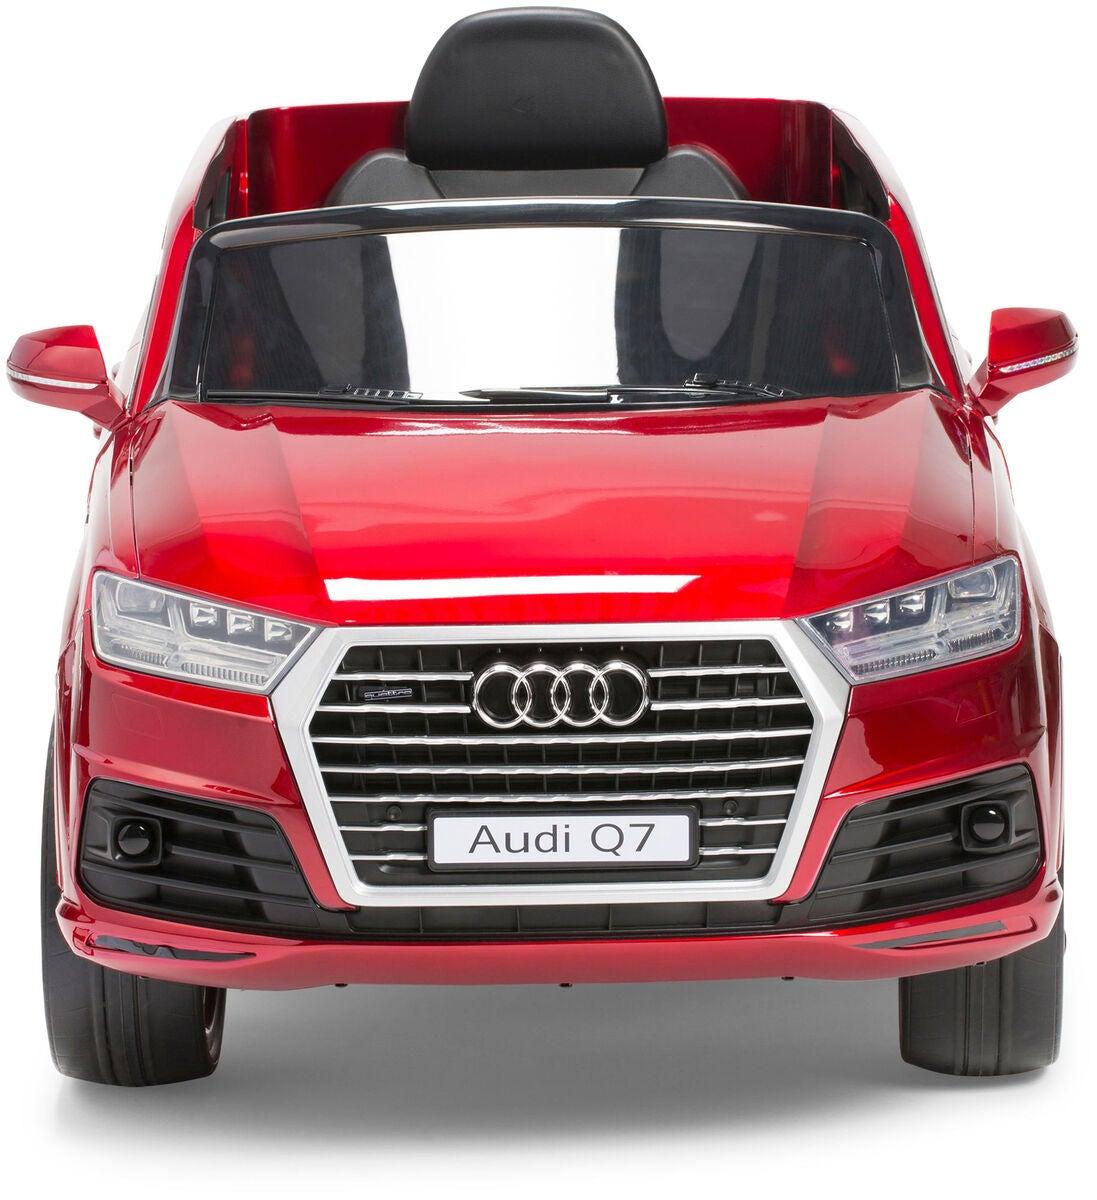 773c2be1d59 Köp Audi Q7 Elbil, Röd | Jollyroom